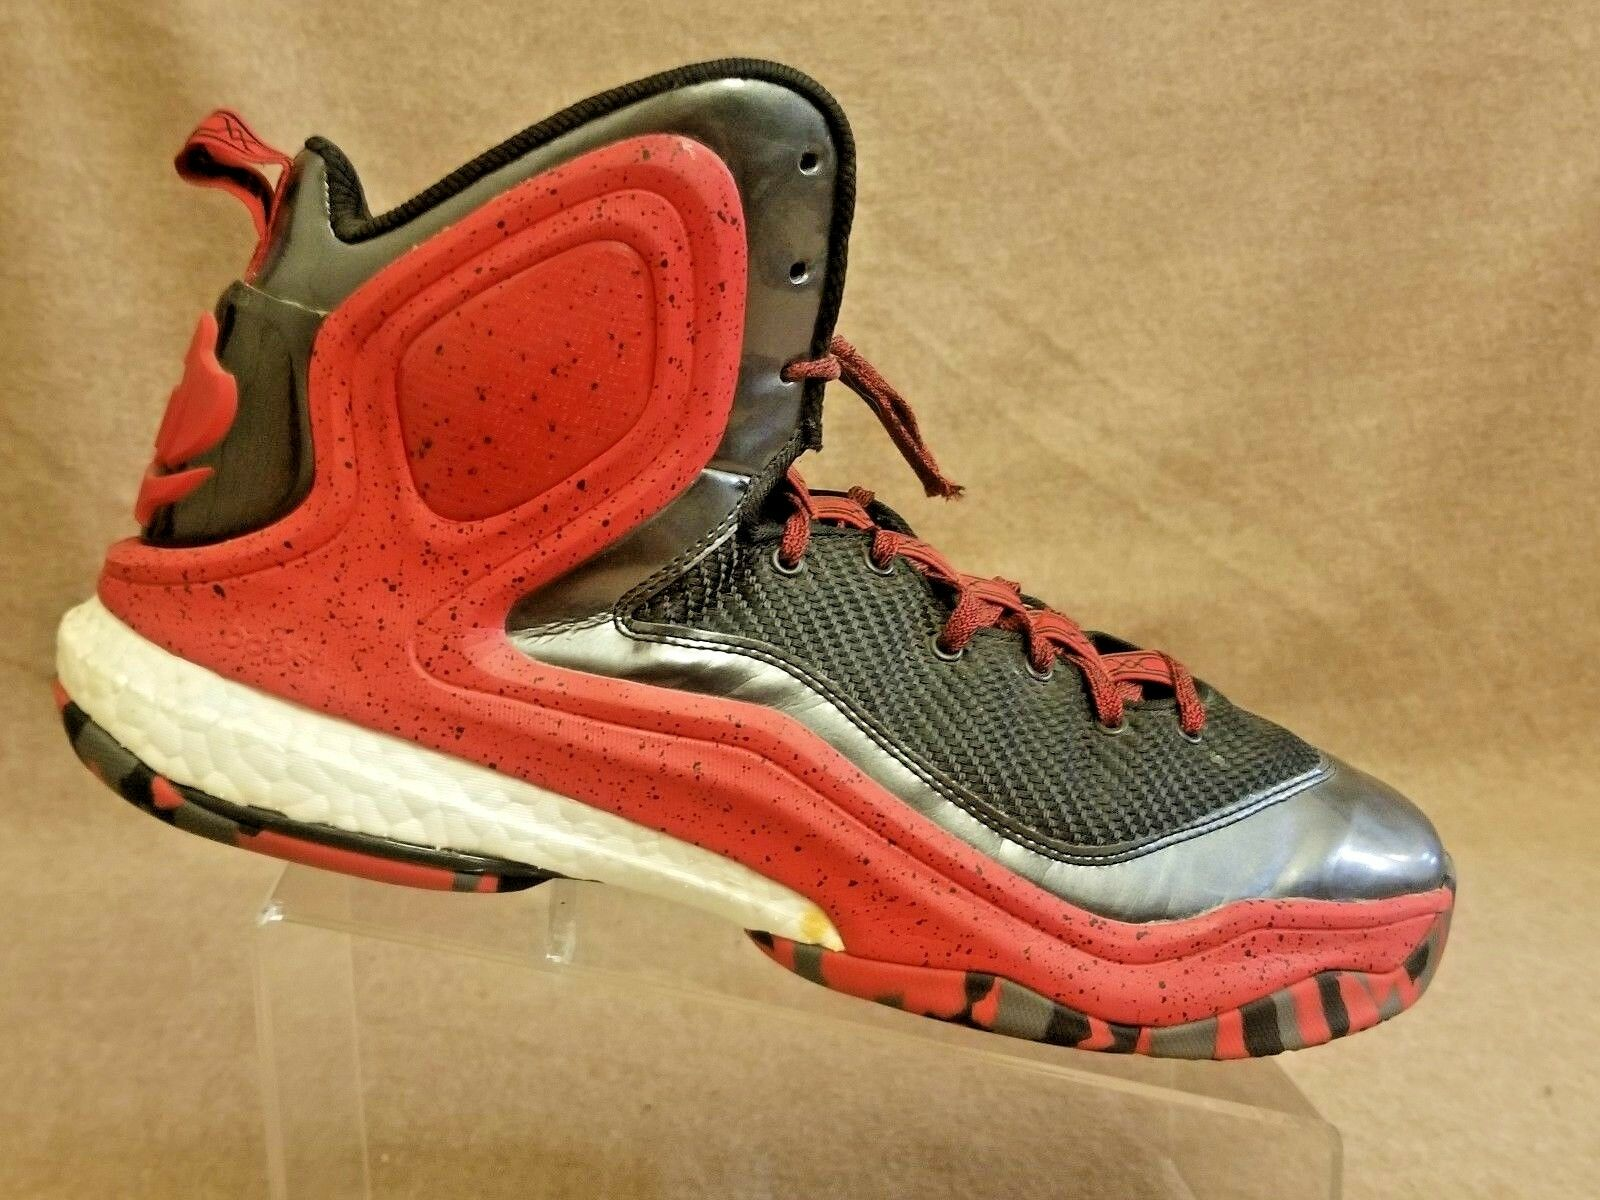 adidas derrick rose stärken 5 männer rot basketball ist schwarz - rot männer - hohe spitze schuhe der größe. efbfcc